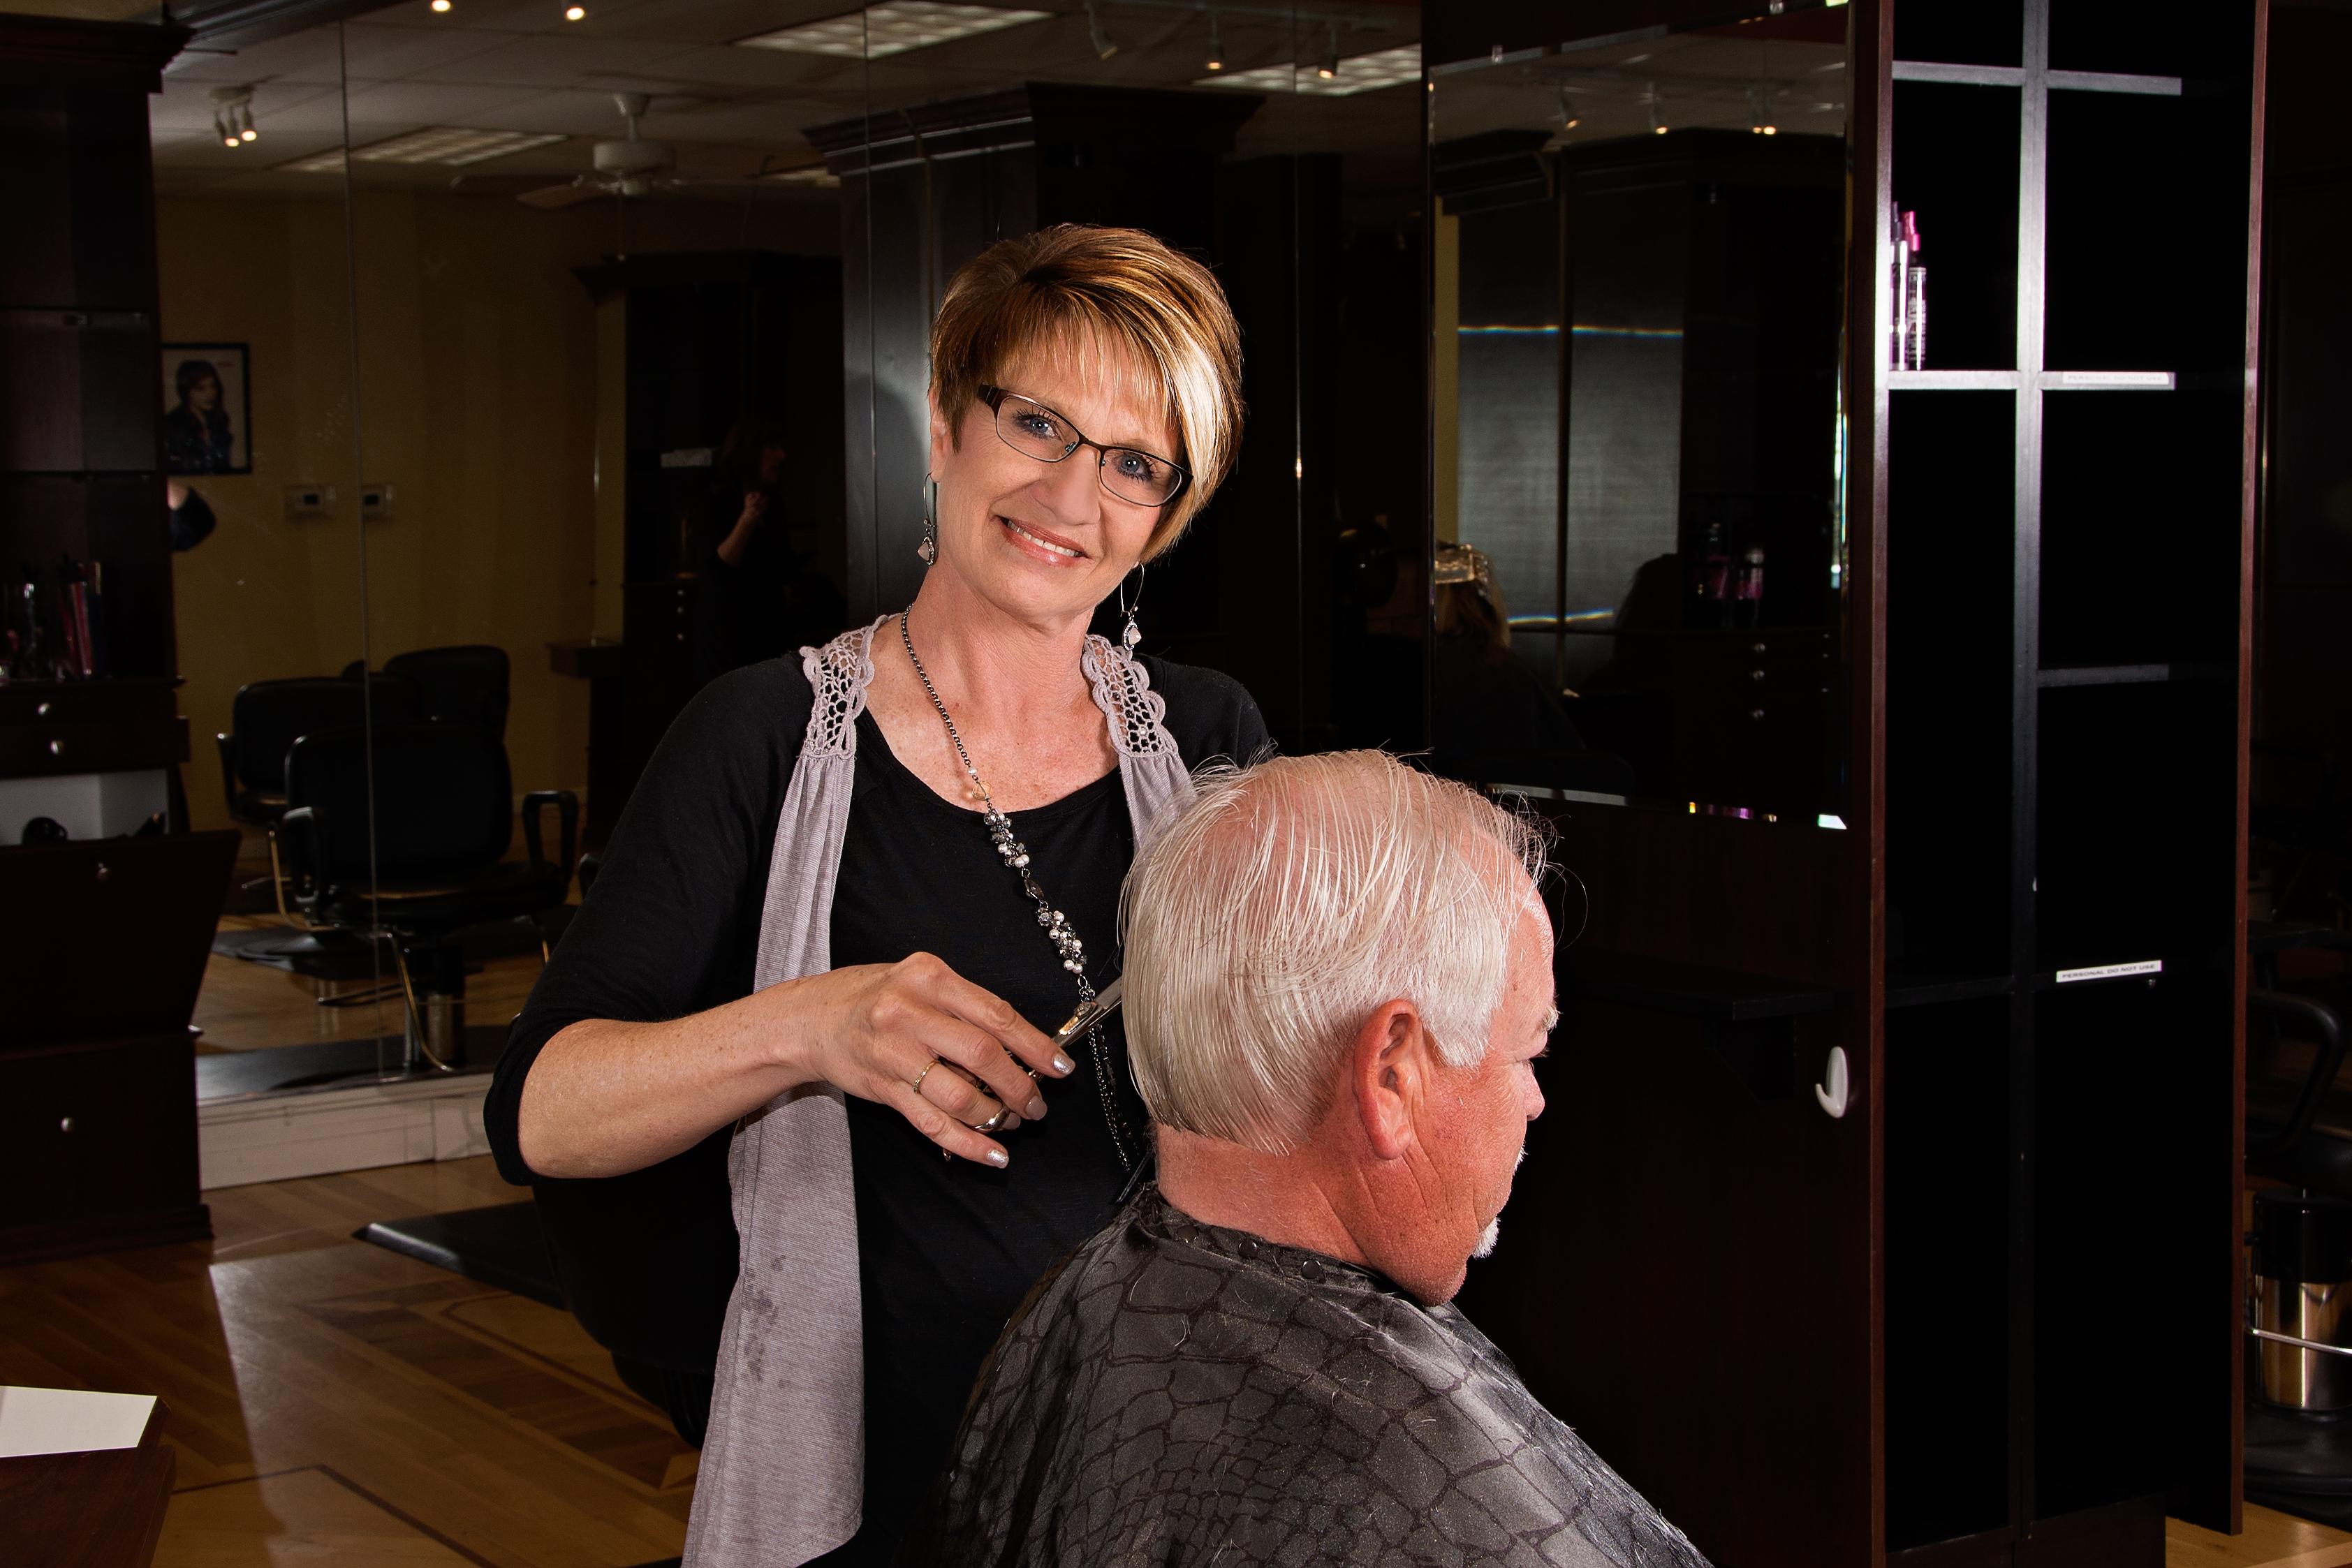 Traci Morton - Hair Stylist at Salon Nevaeh in Littleton, CO